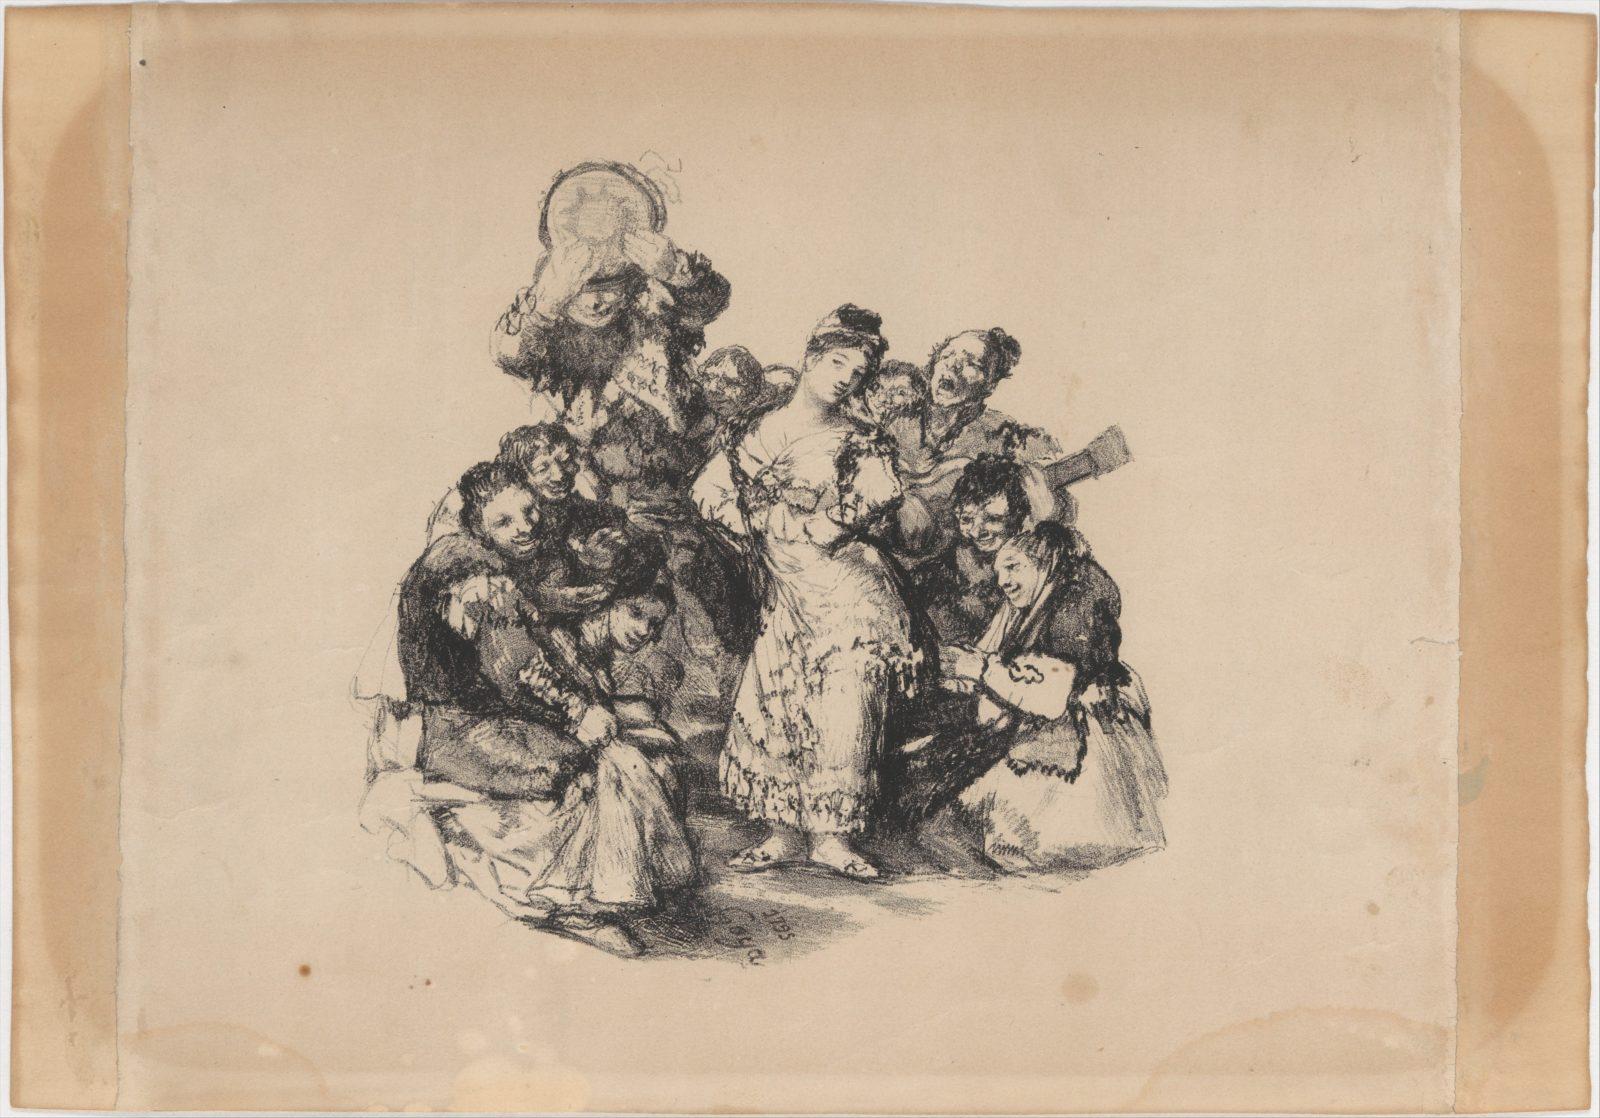 El vito (The Andalusian dance)